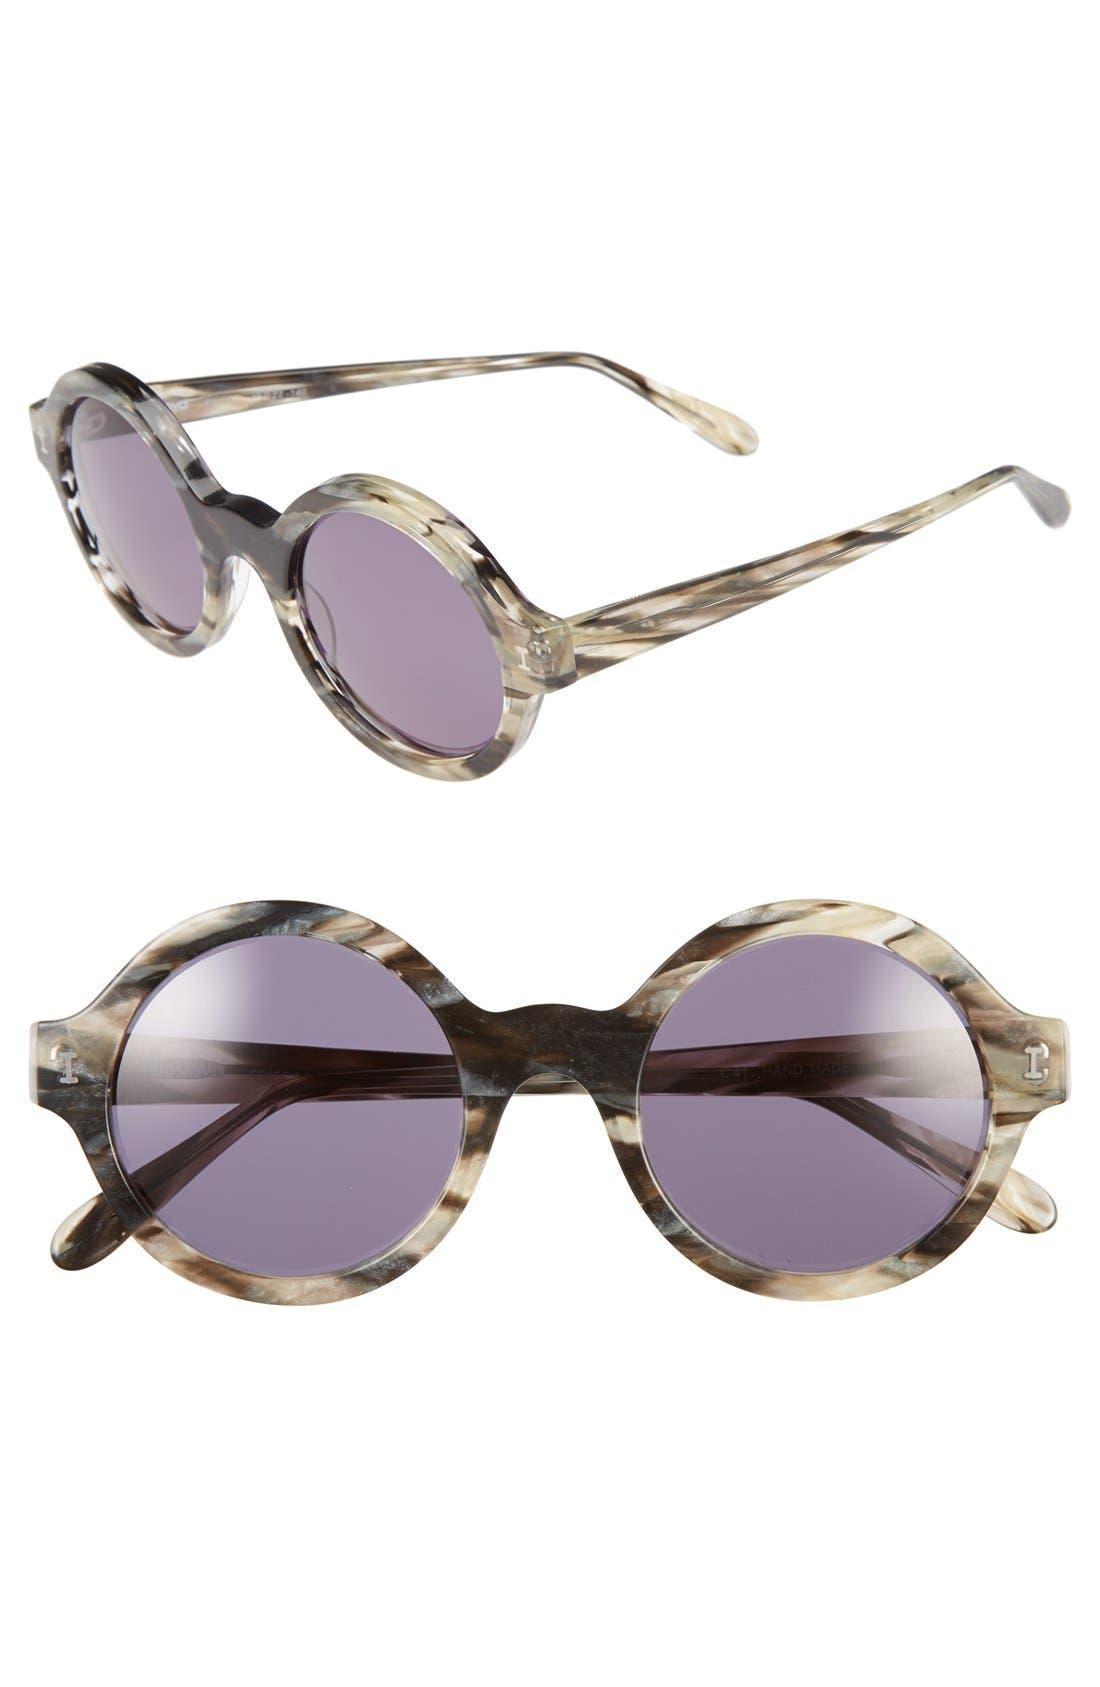 Main Image - Illesteva 'Frieda' 48mm Retro Sunglasses